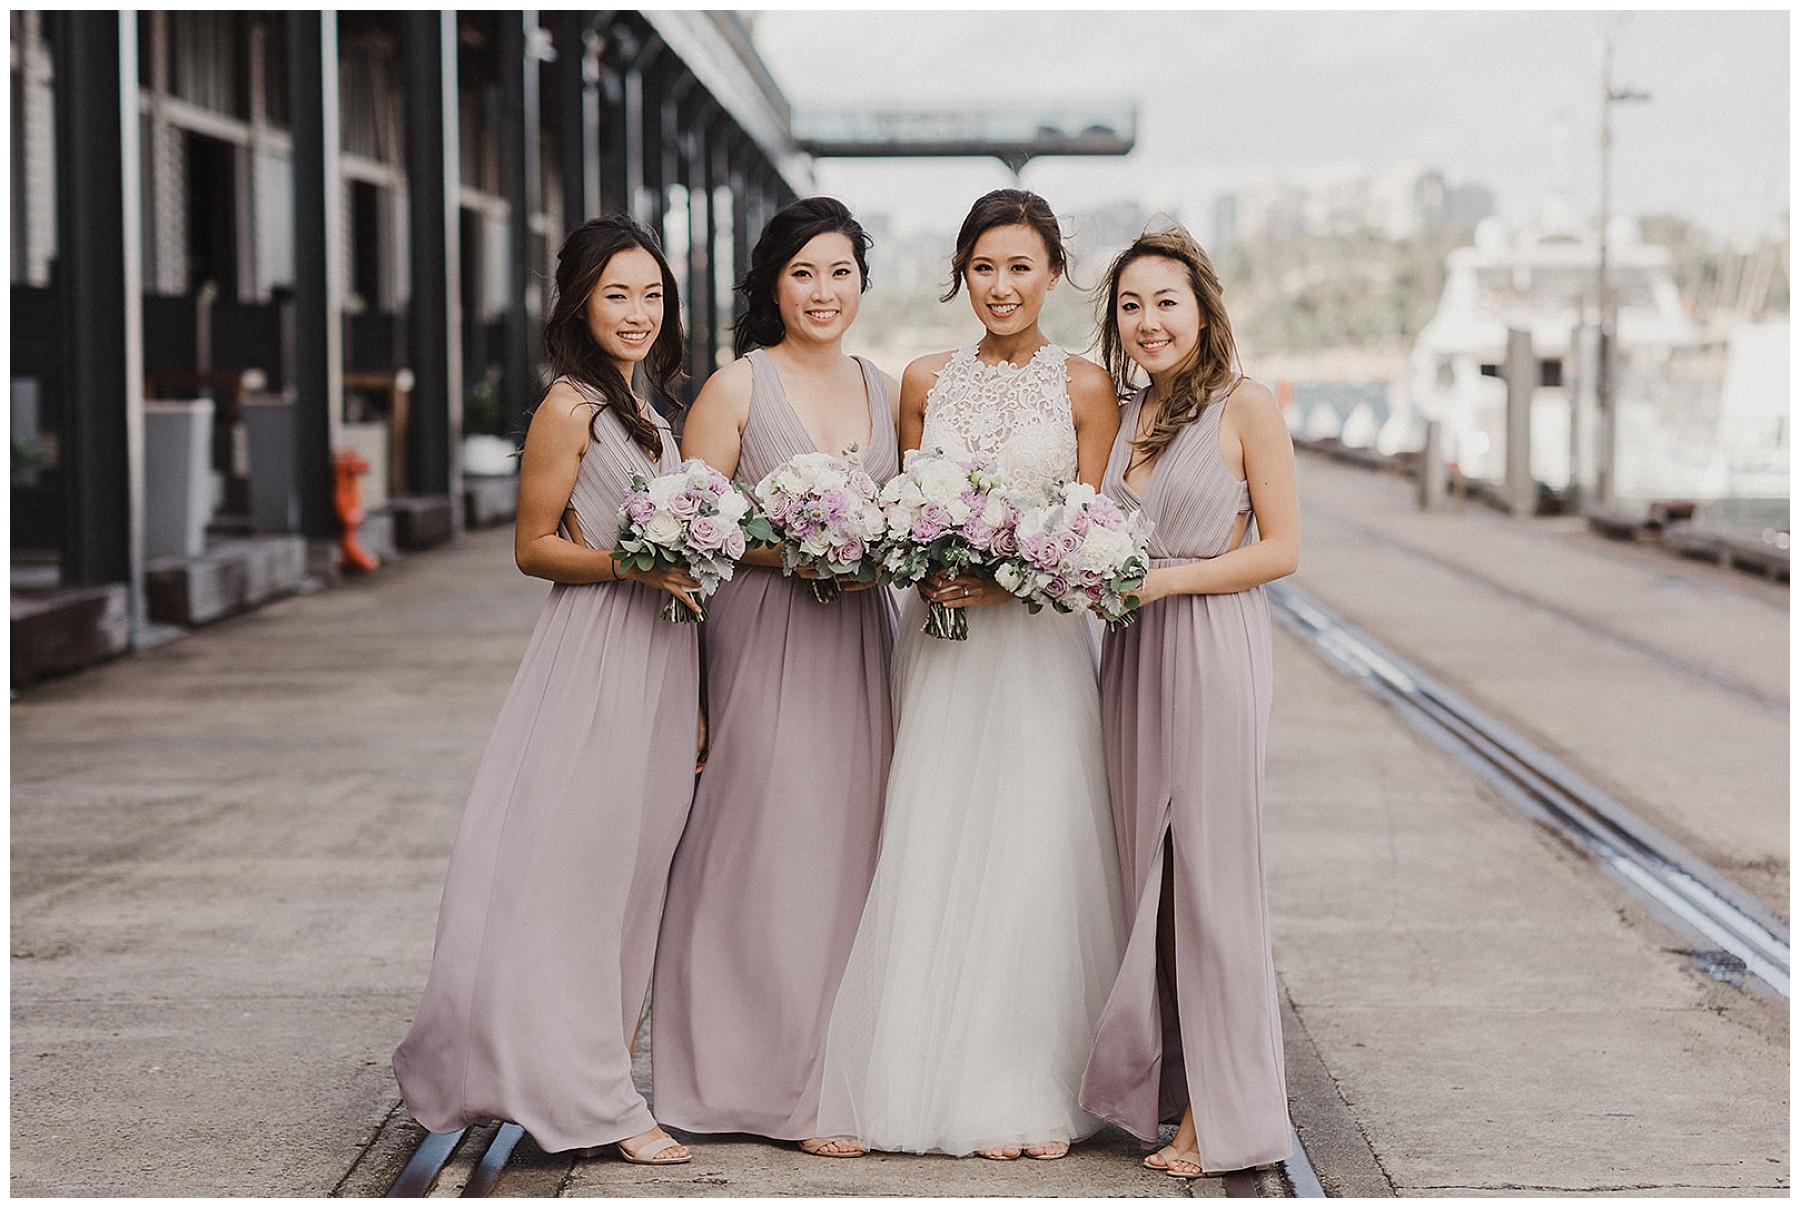 Sydney Bride with her bridesmaids